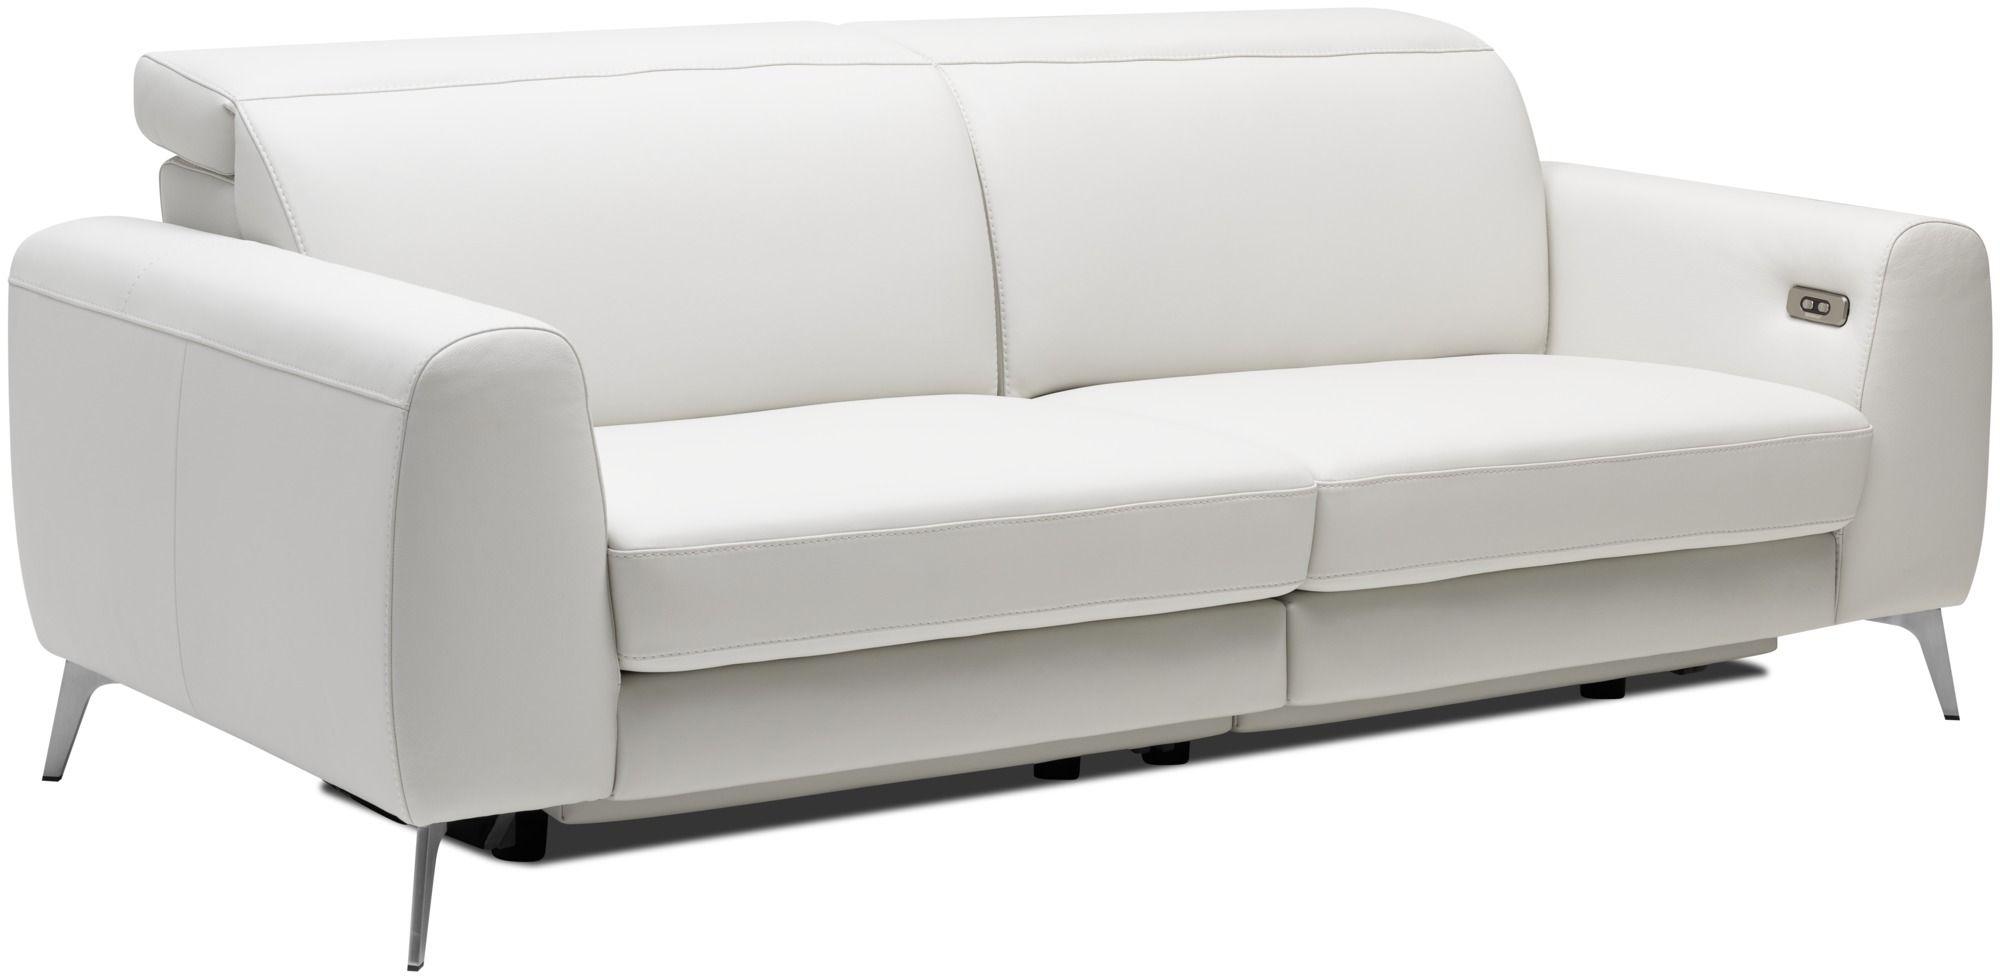 Madison Modern Sofa - BoConcept Furniture Stores Sydney | Lounging ...